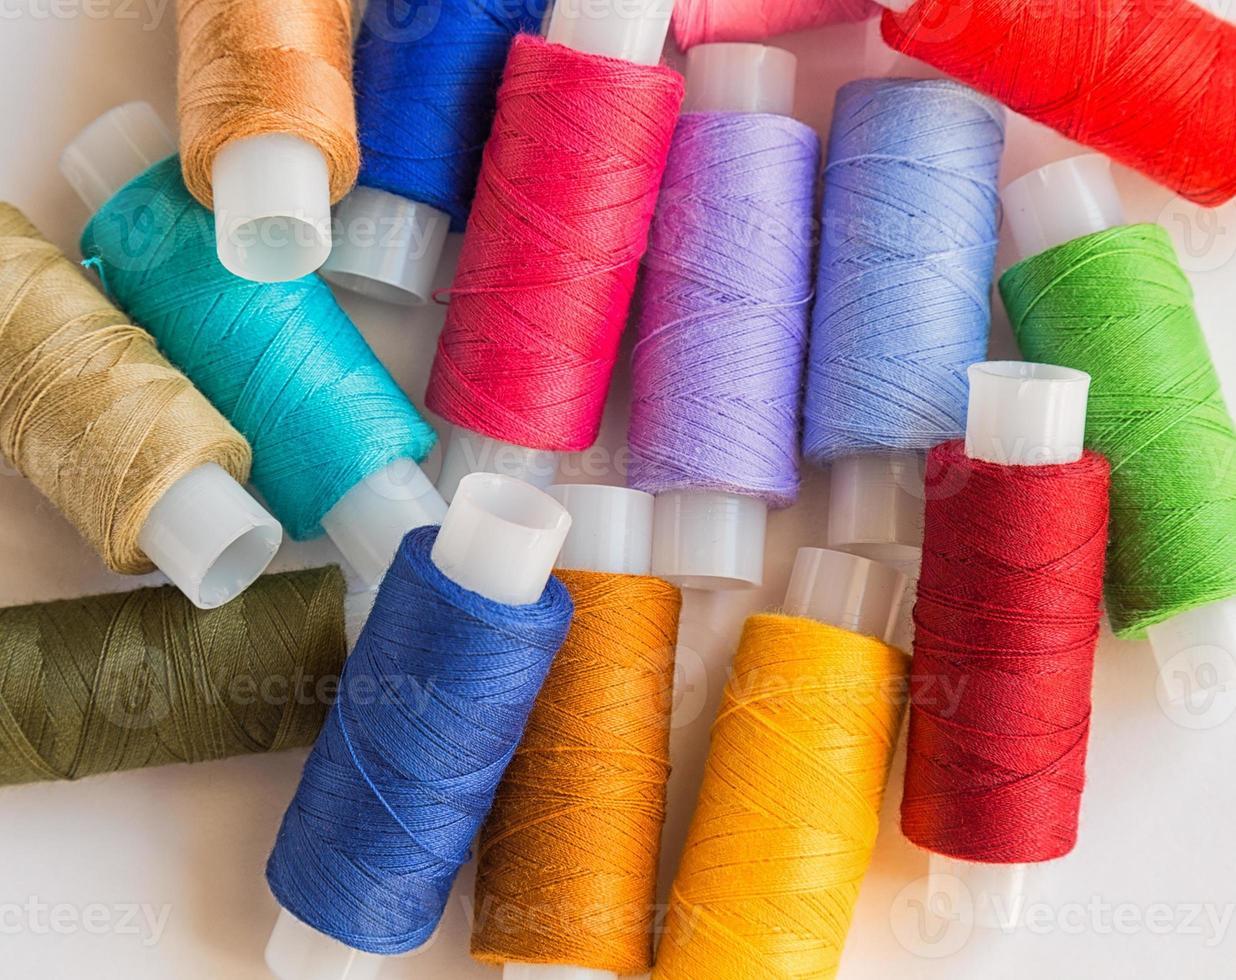 Spools of colorful thread photo